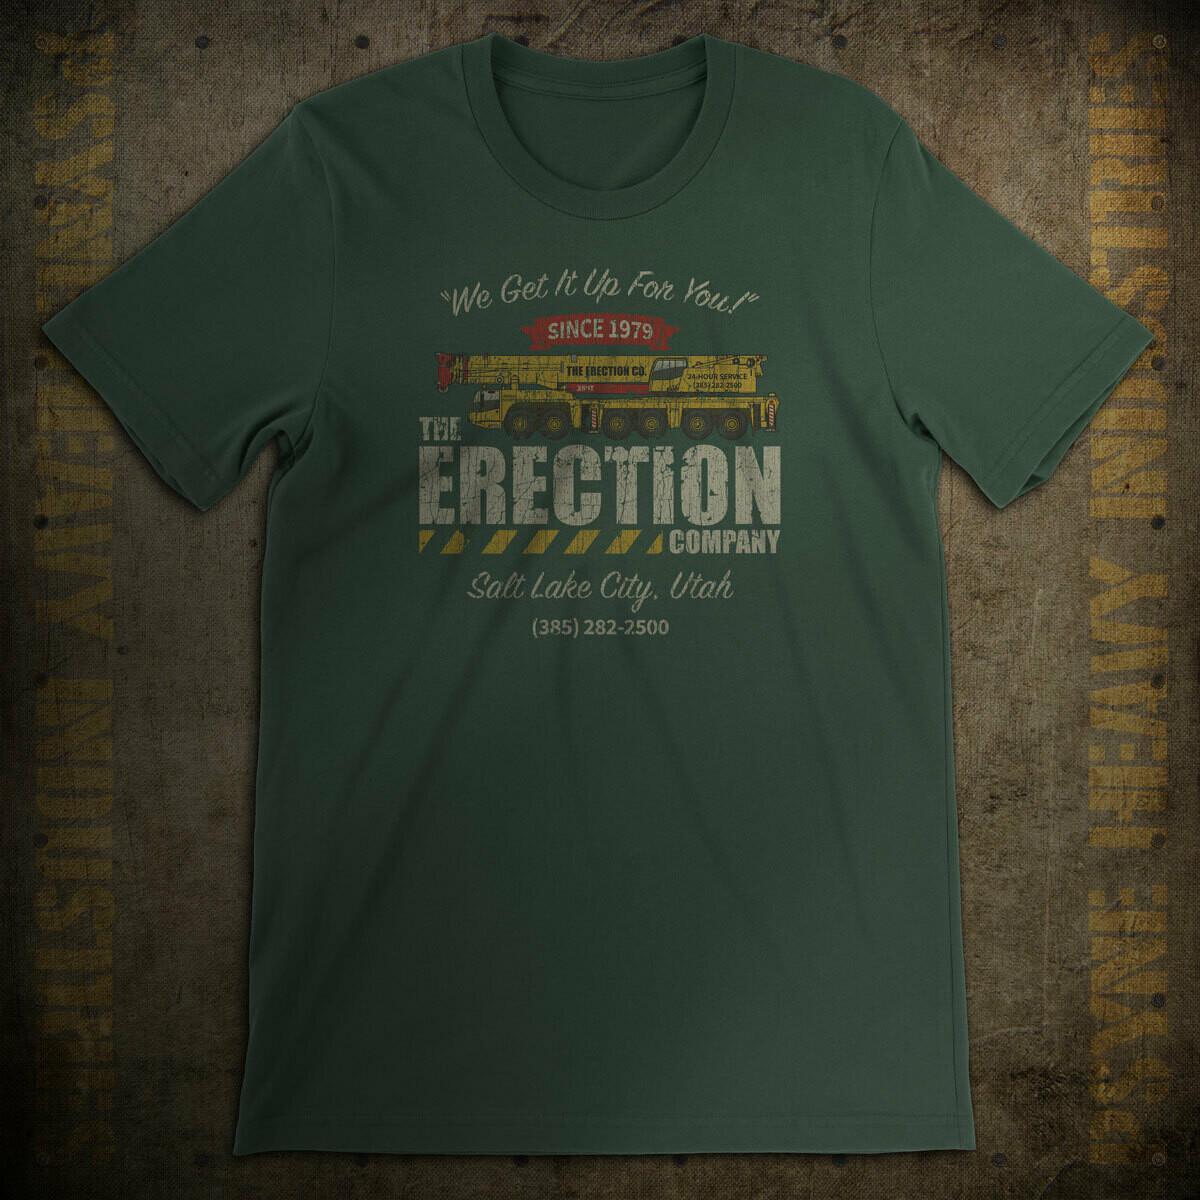 The Erection Company Vintage T-Shirt